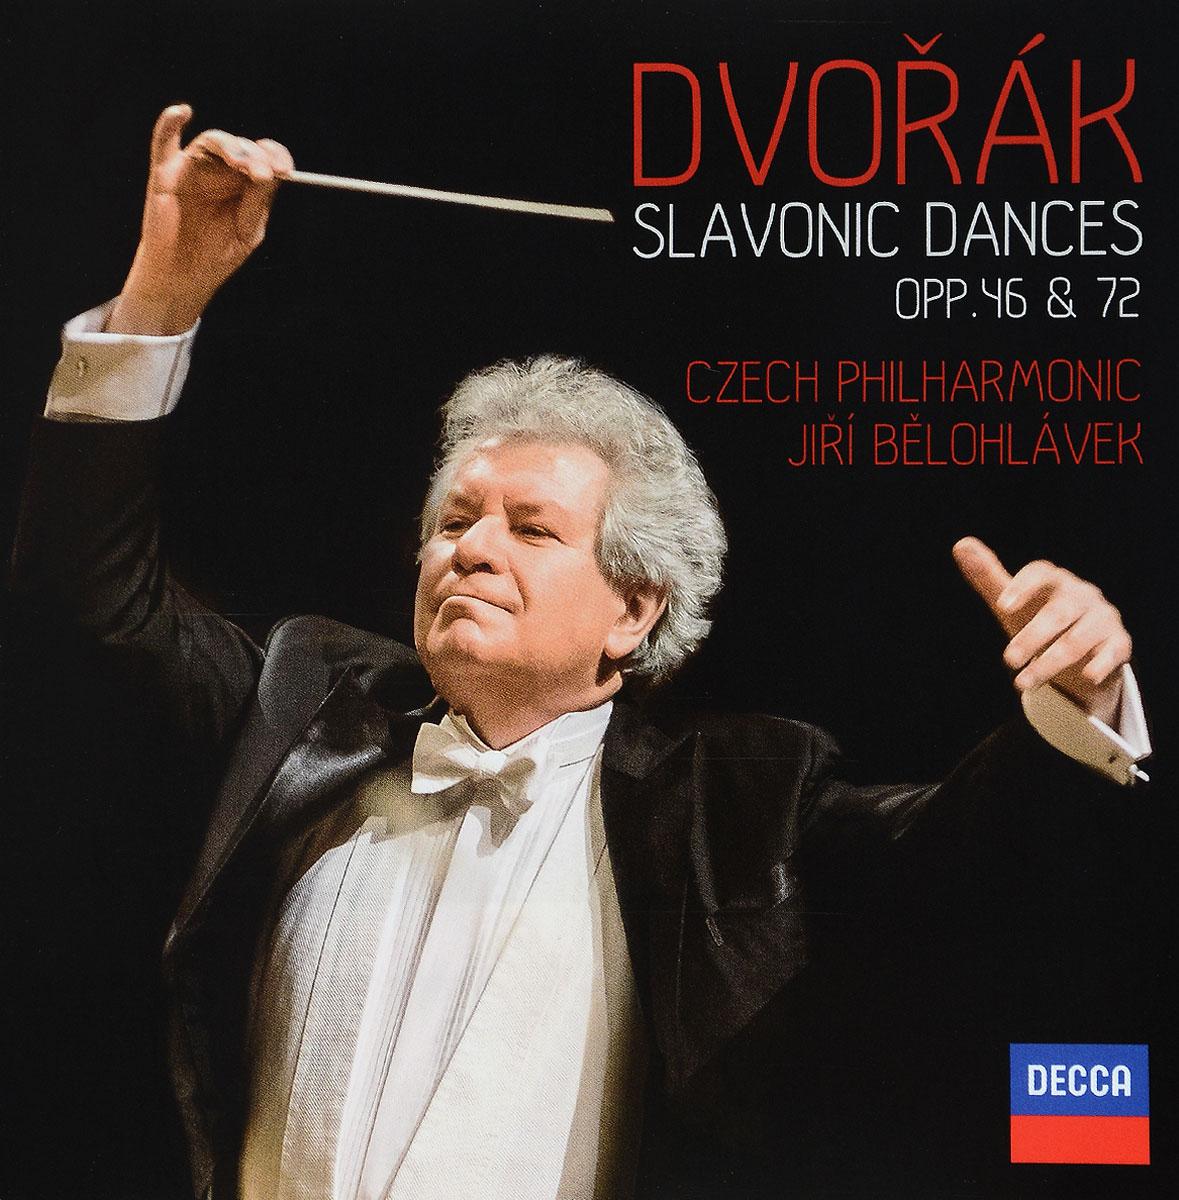 Йири Белолавек,Czech Philharmonic Jiri Belohlavek, Czech Philharmonic. Dvorak. Slavonic Dances Opp. 46 & 72 недорого